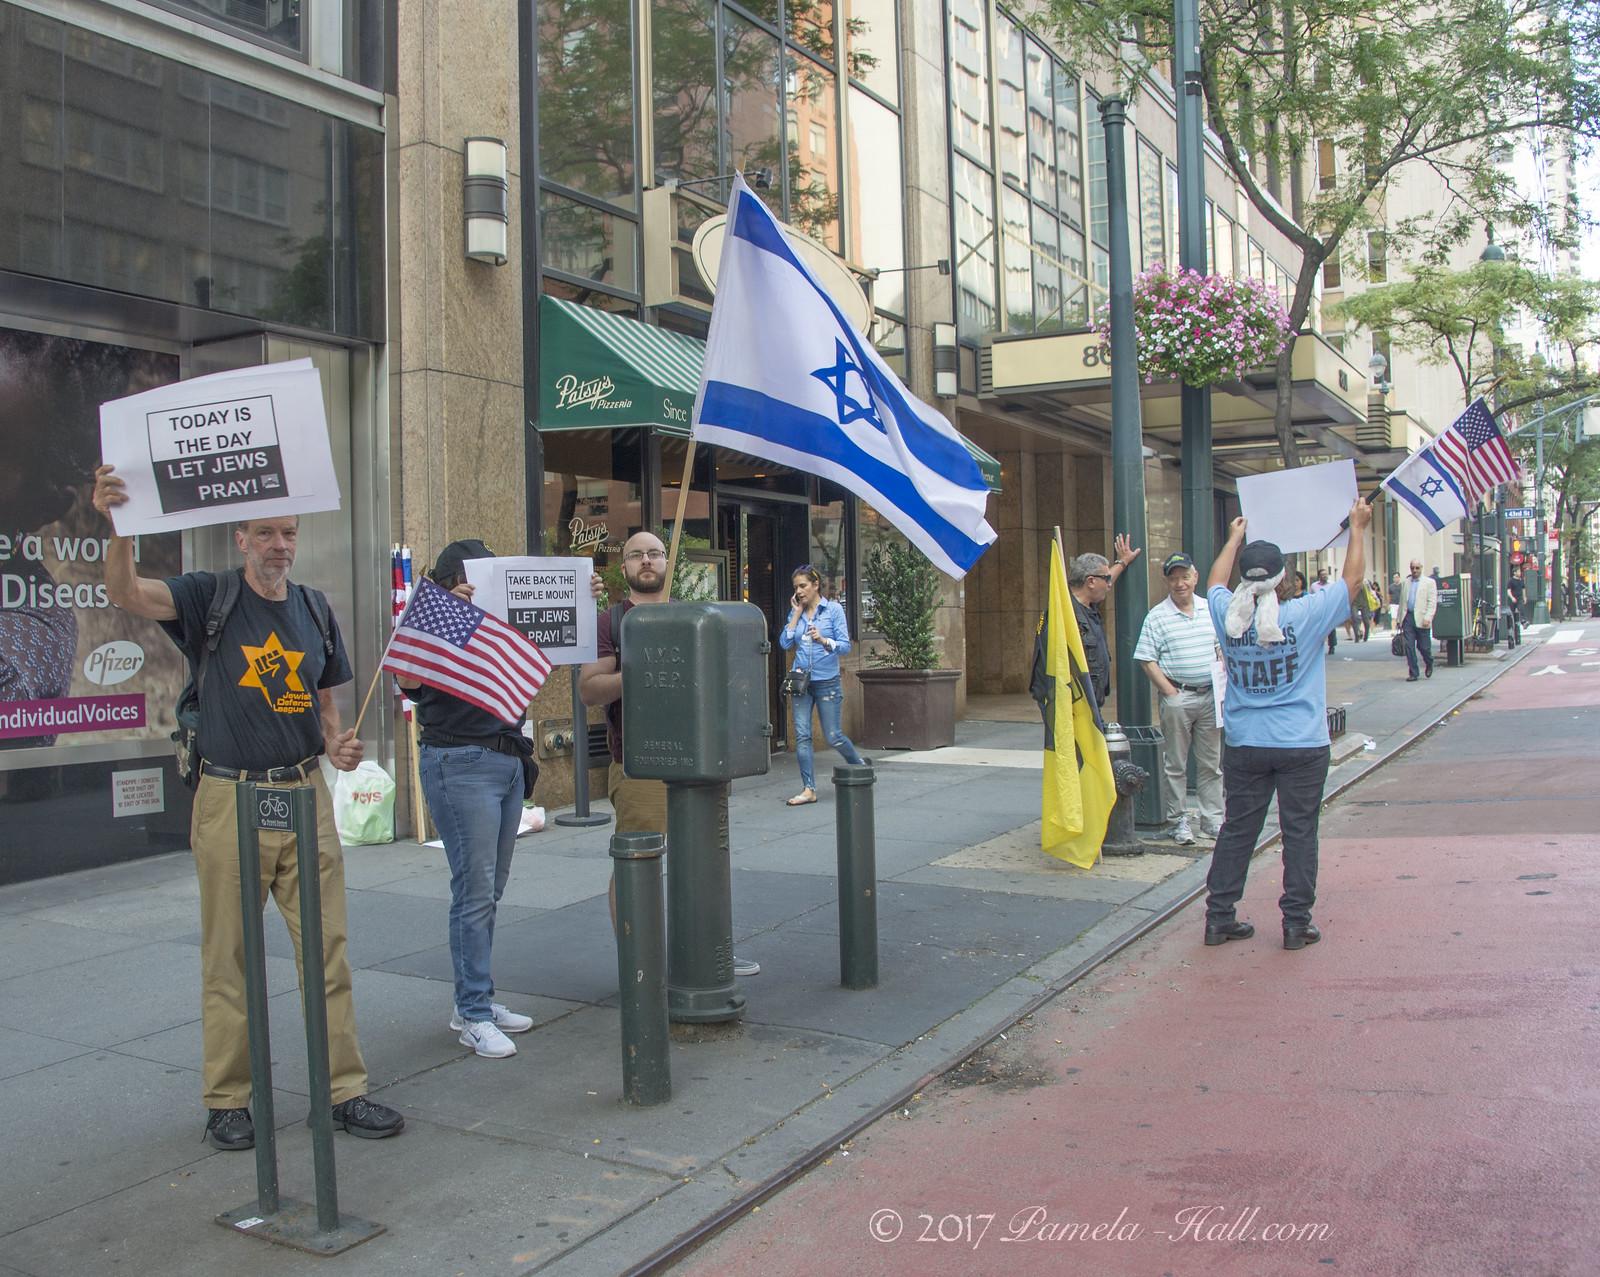 Rally for Jewish Prayer Upsets Israeli Consulate | American-Rattlesnake